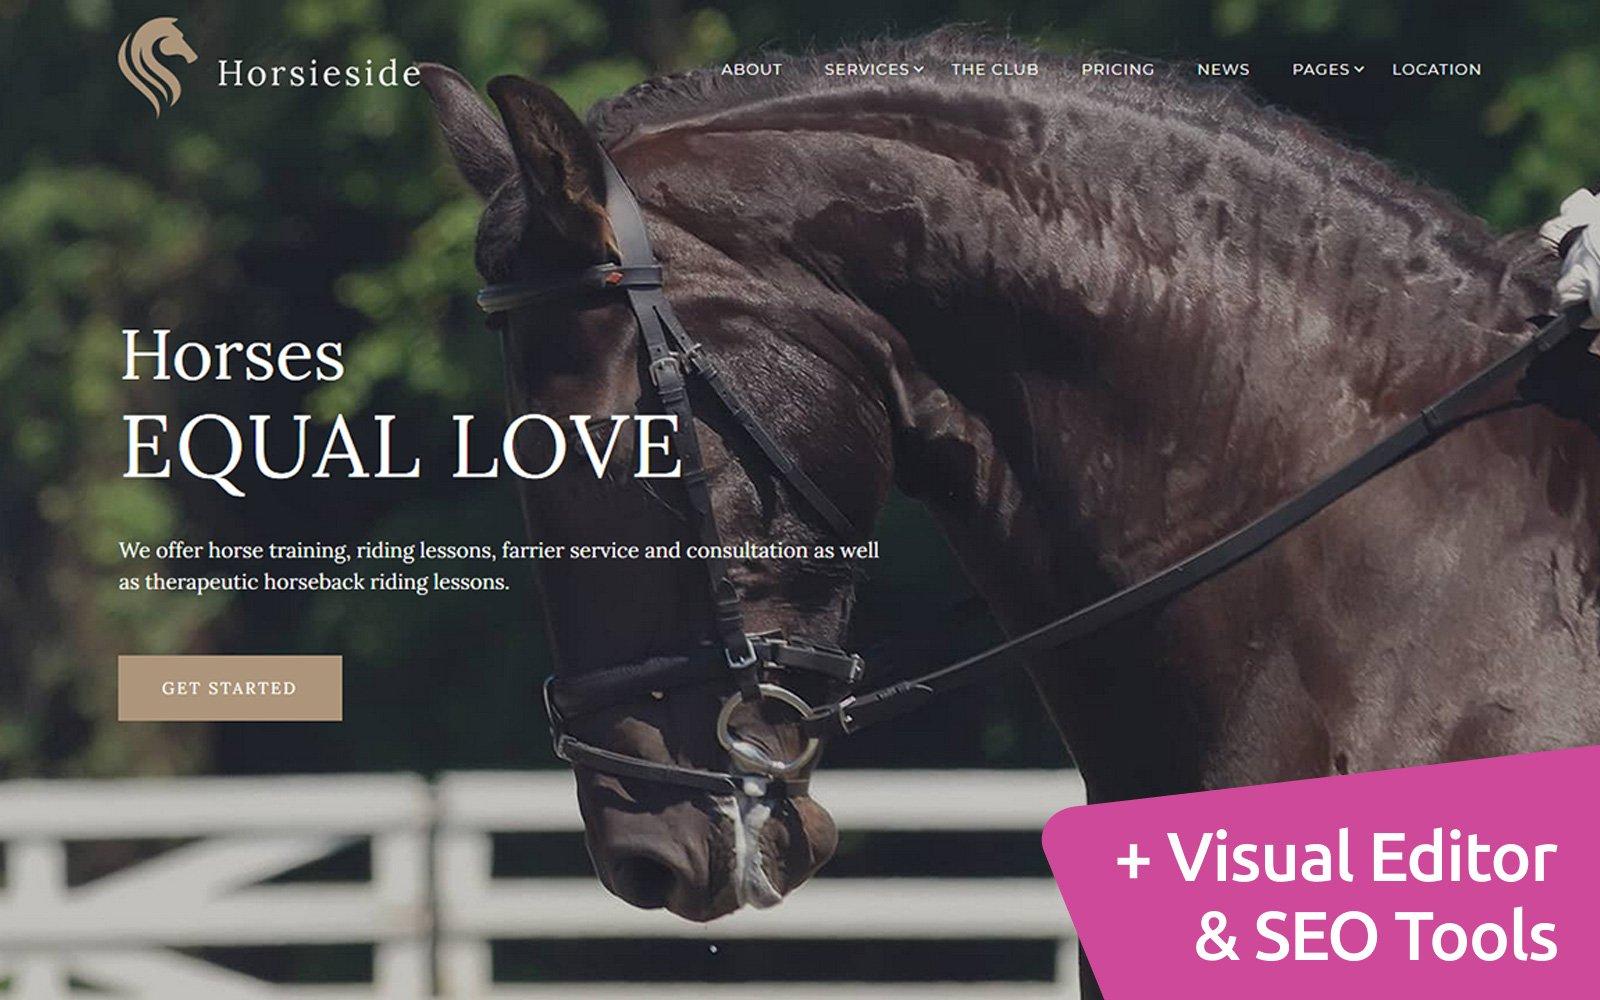 Horsieside - Equestrian Center Moto CMS 3 Template